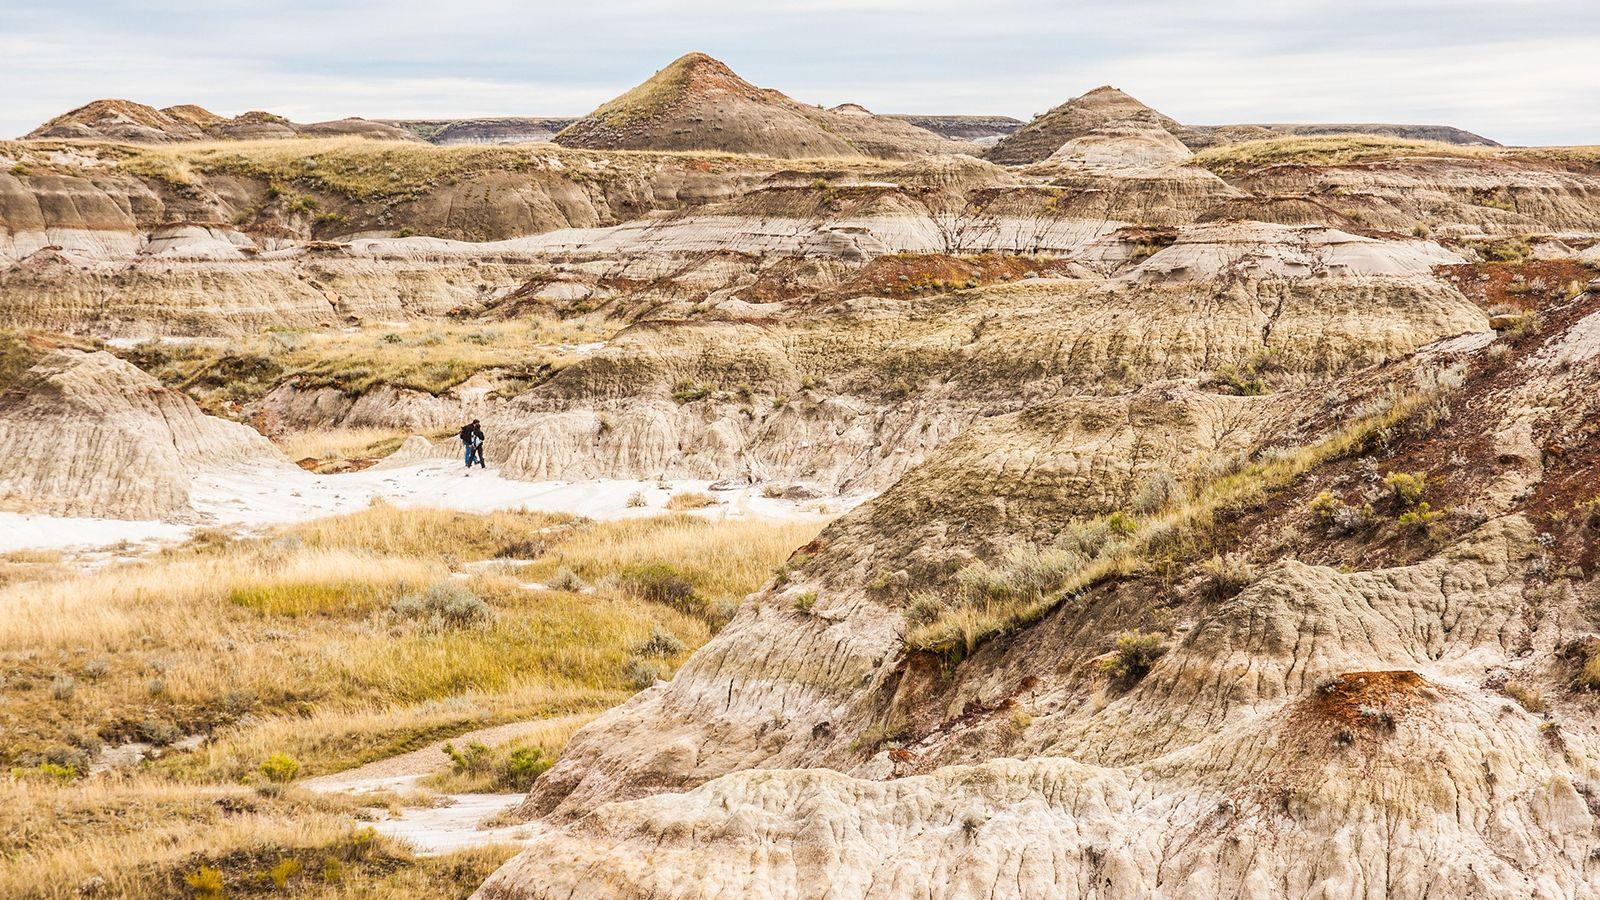 A visitor walks through Alberta's Dinosaur Provincial Park.